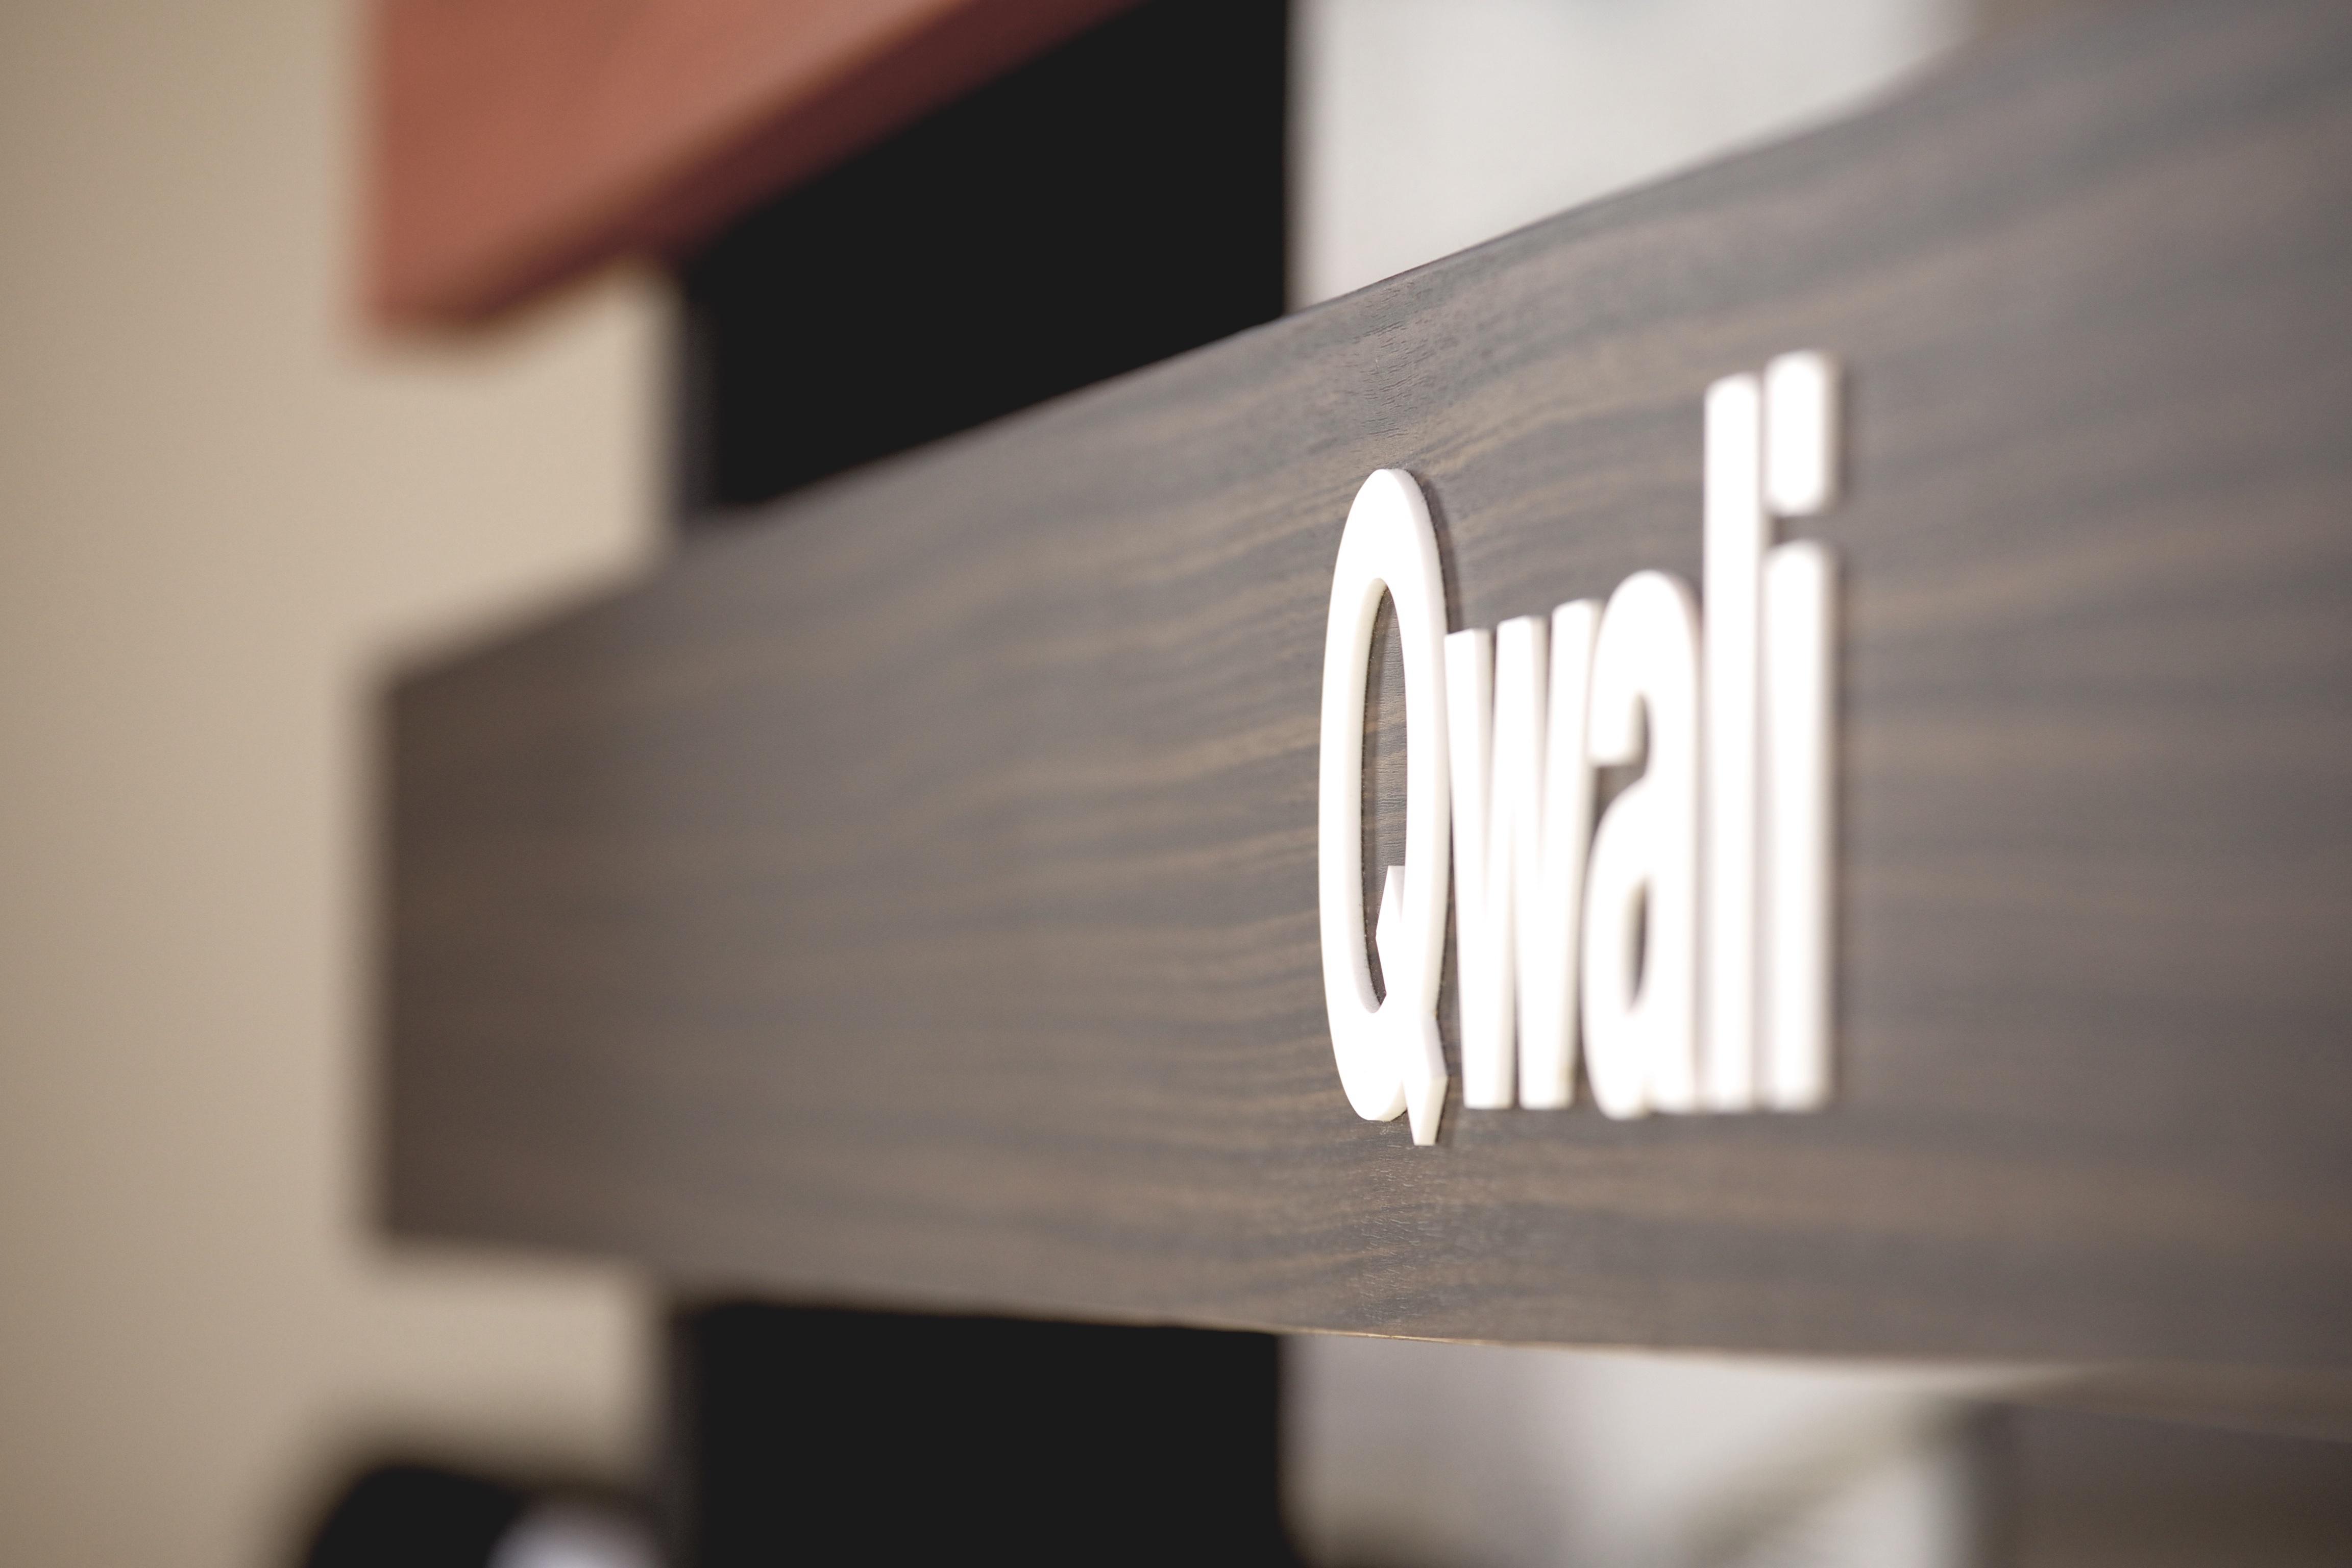 Qwali_3.jpg